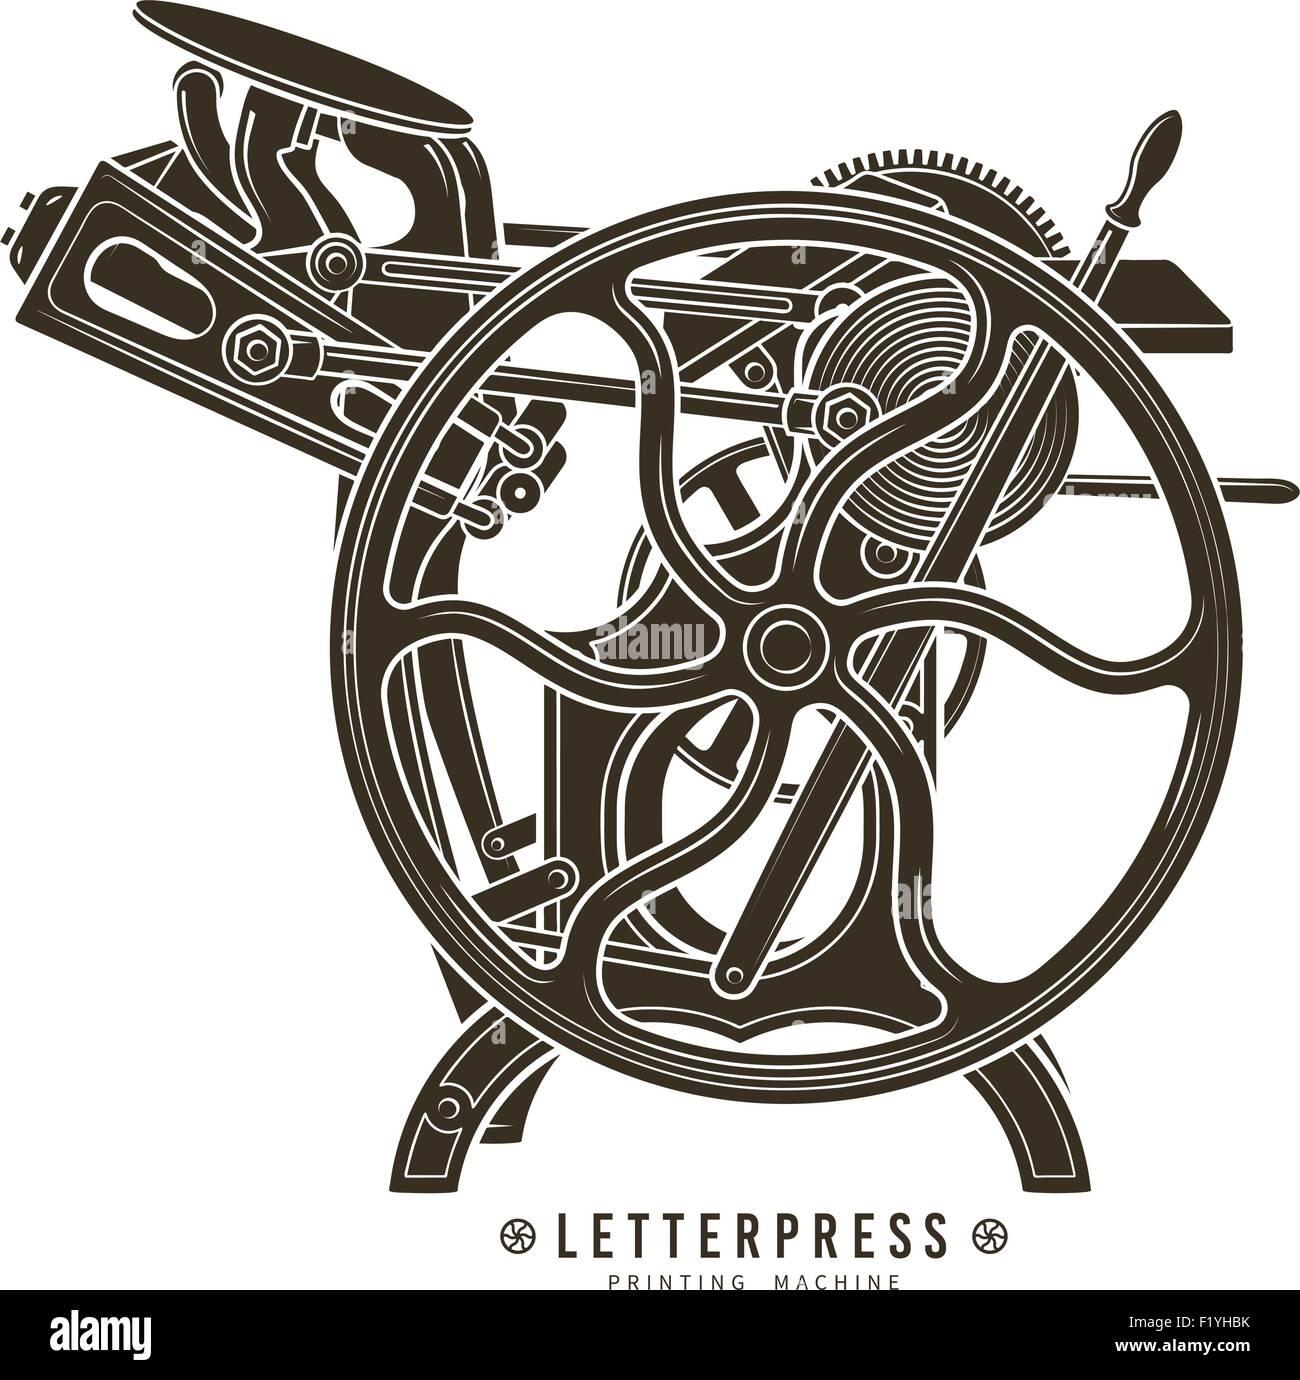 letterpress printing machine vector illustration vintage print logo